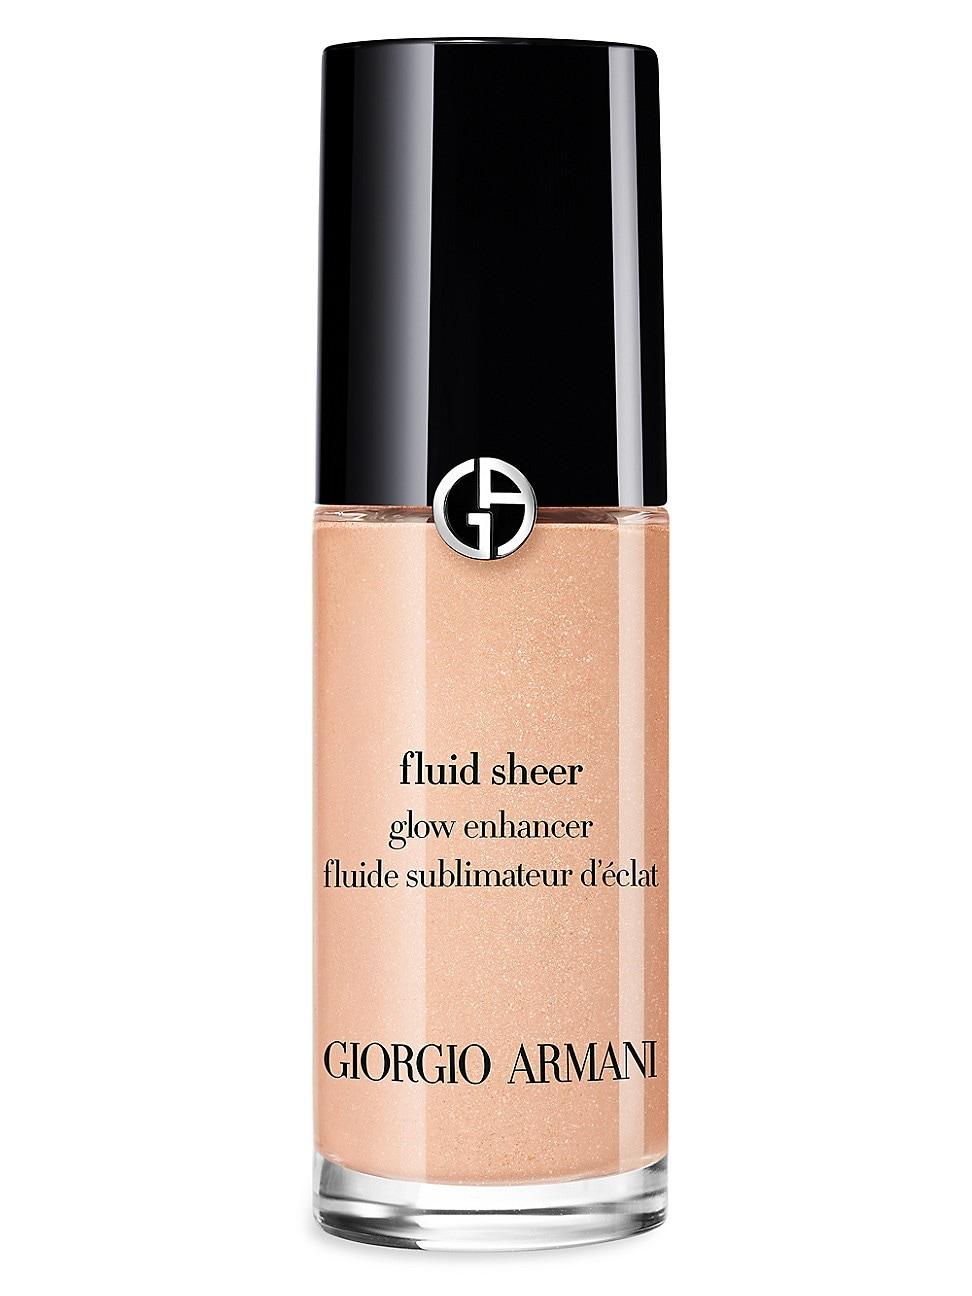 Giorgio Armani FLUID SHEER GLOW ENHANCER